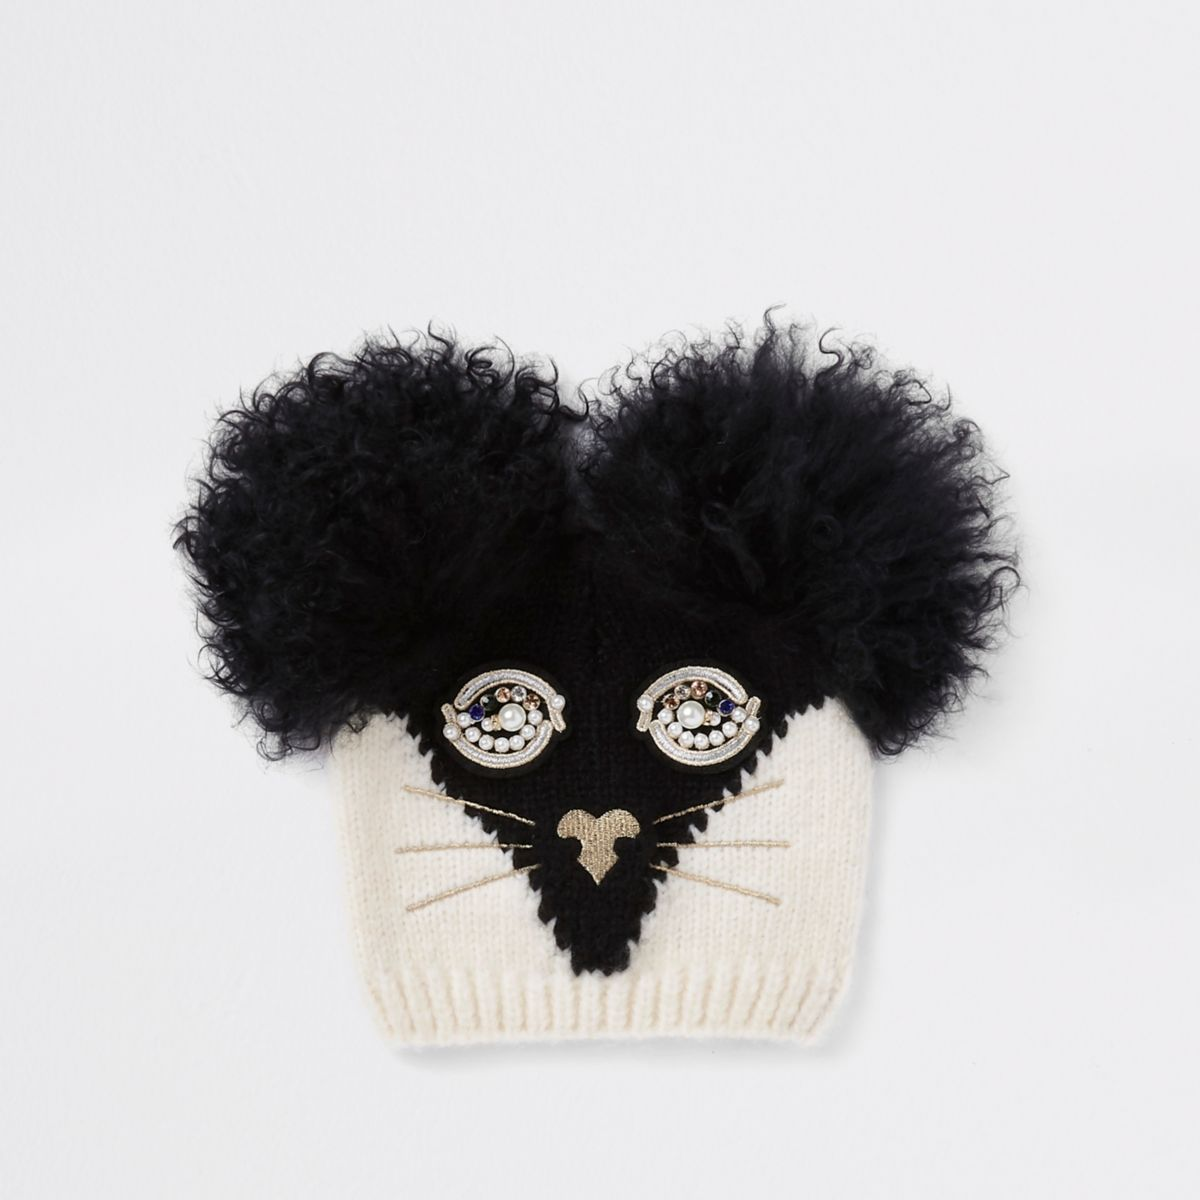 RI 30 girls black cat face beanie hat